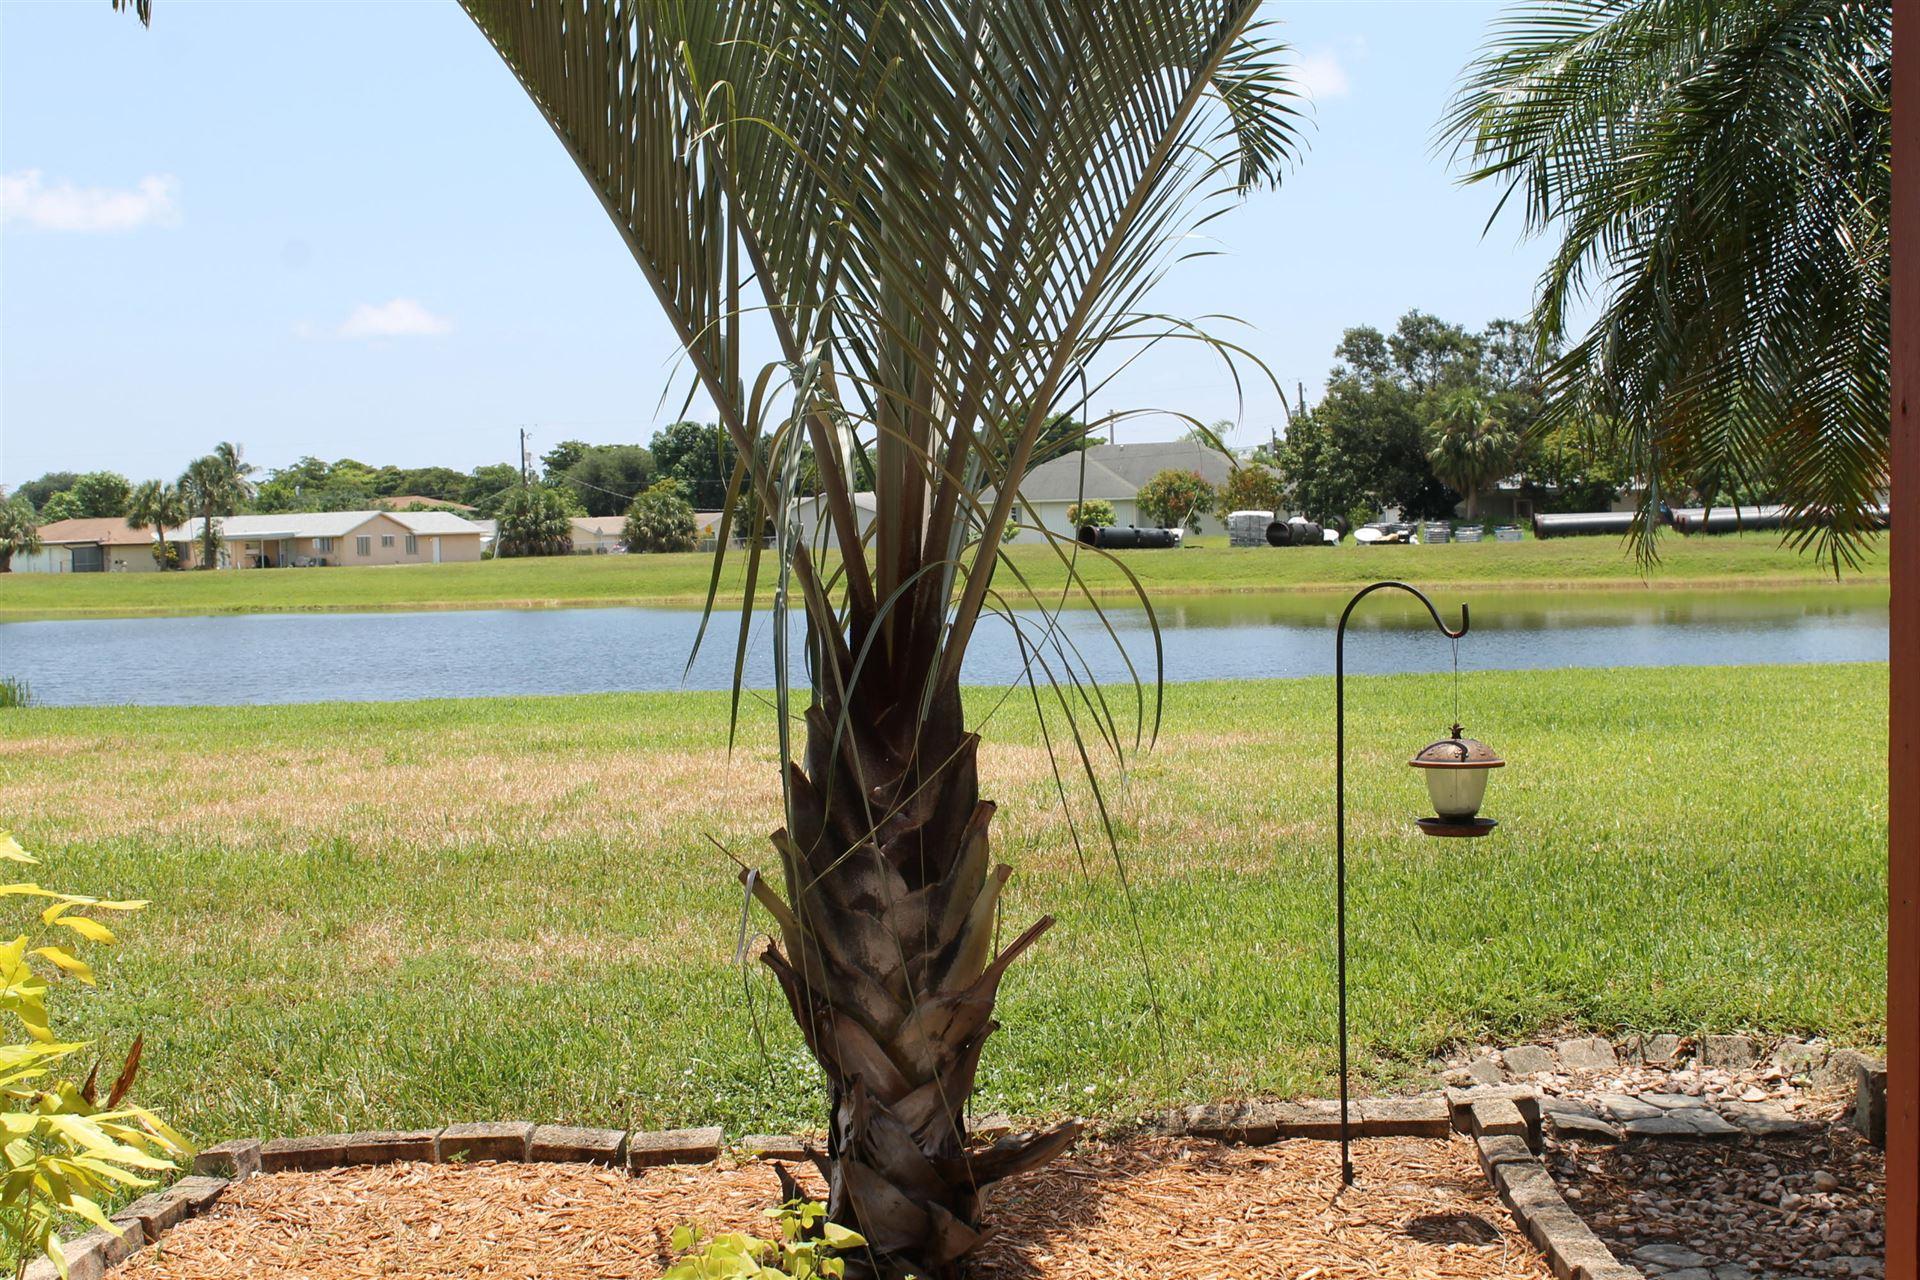 1800 Embassy Drive #125, West Palm Beach, FL 33401 - #: RX-10636579